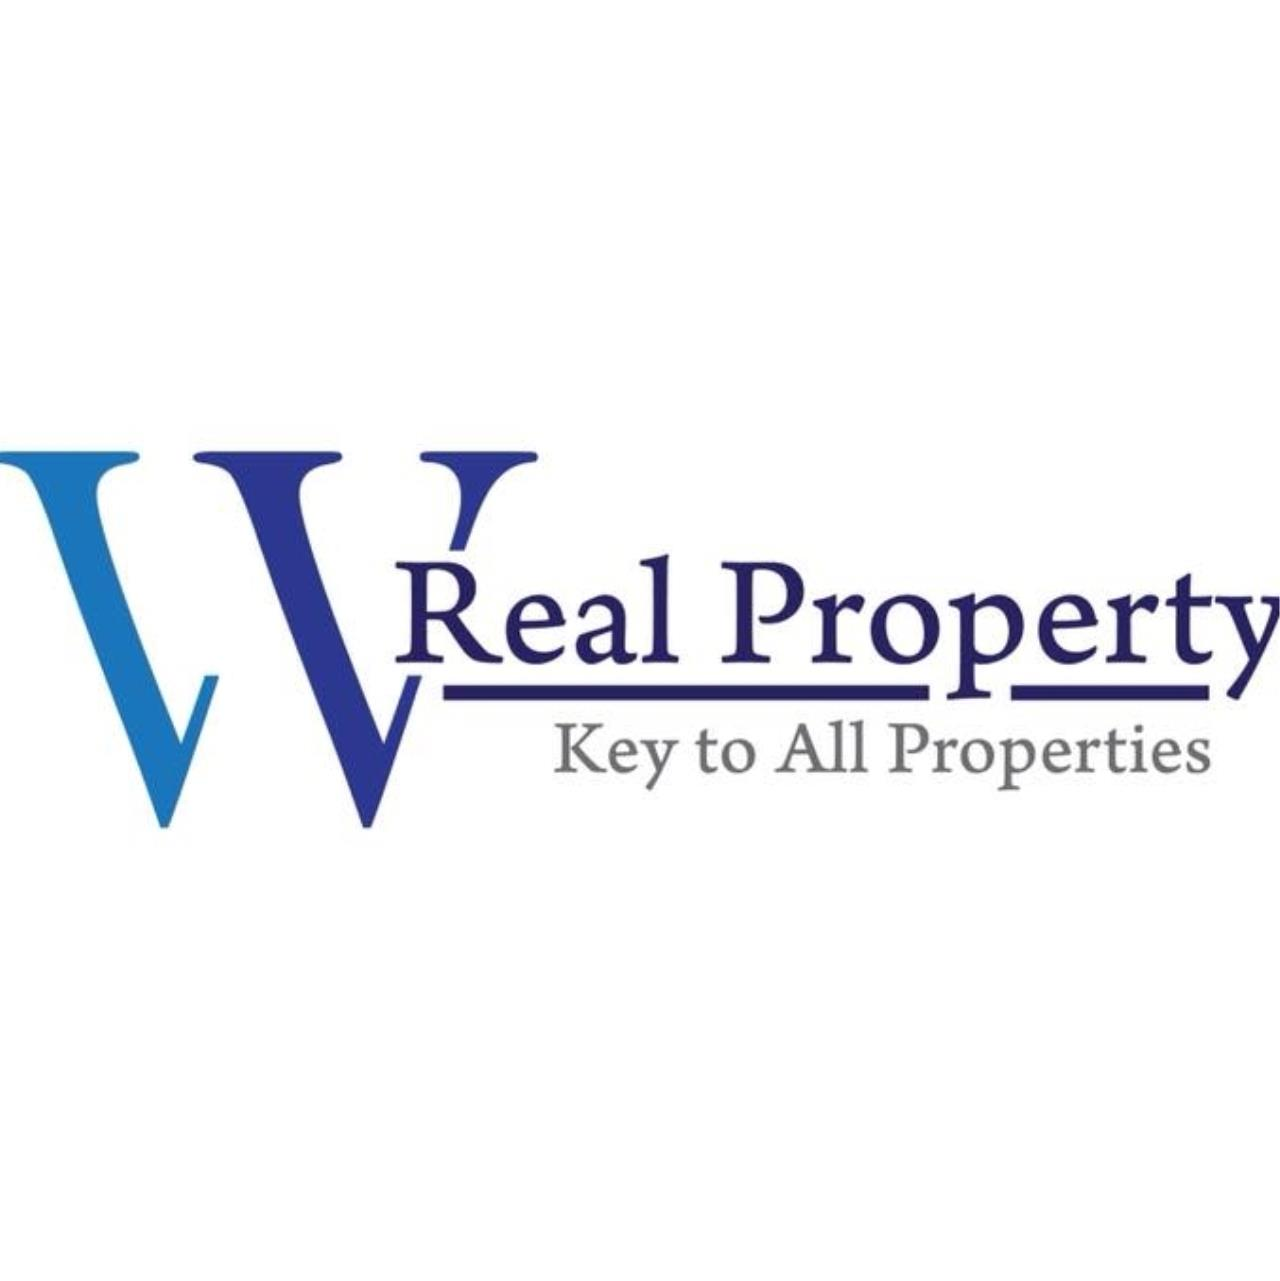 W Real Property logo